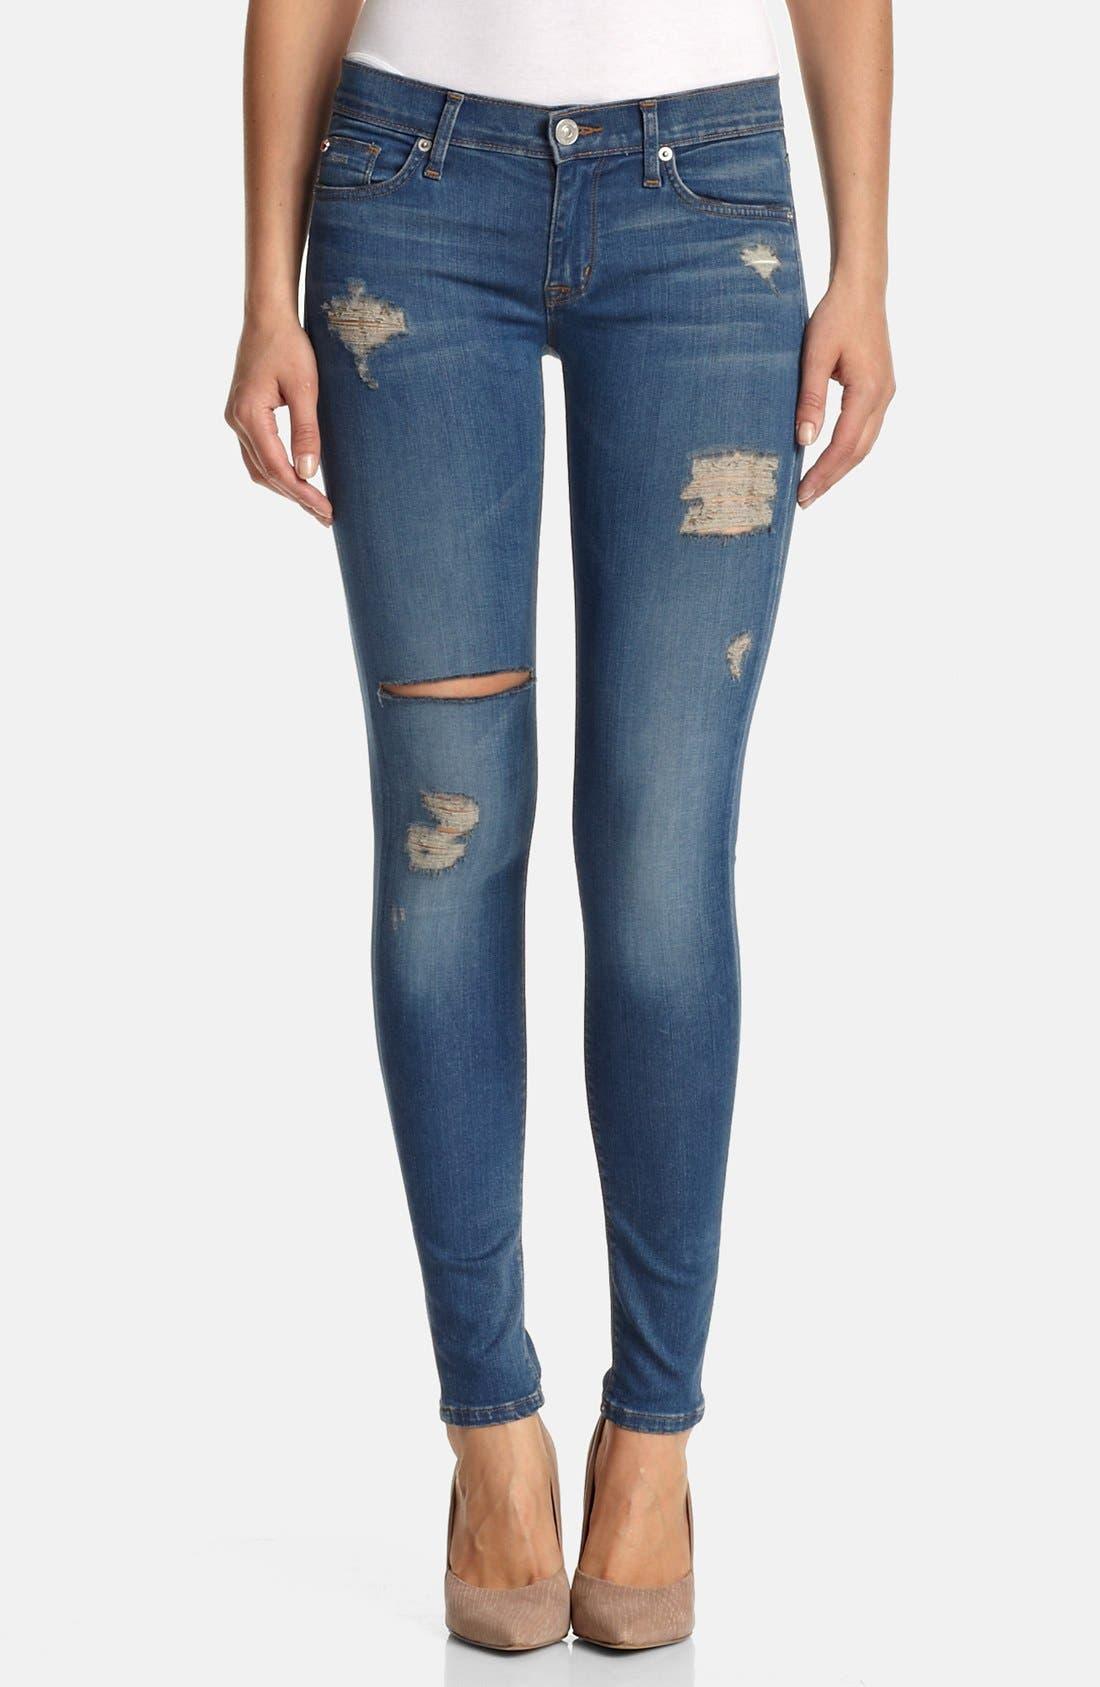 Main Image - Hudson Jeans 'Krista' Super Skinny Jeans (Foxey)